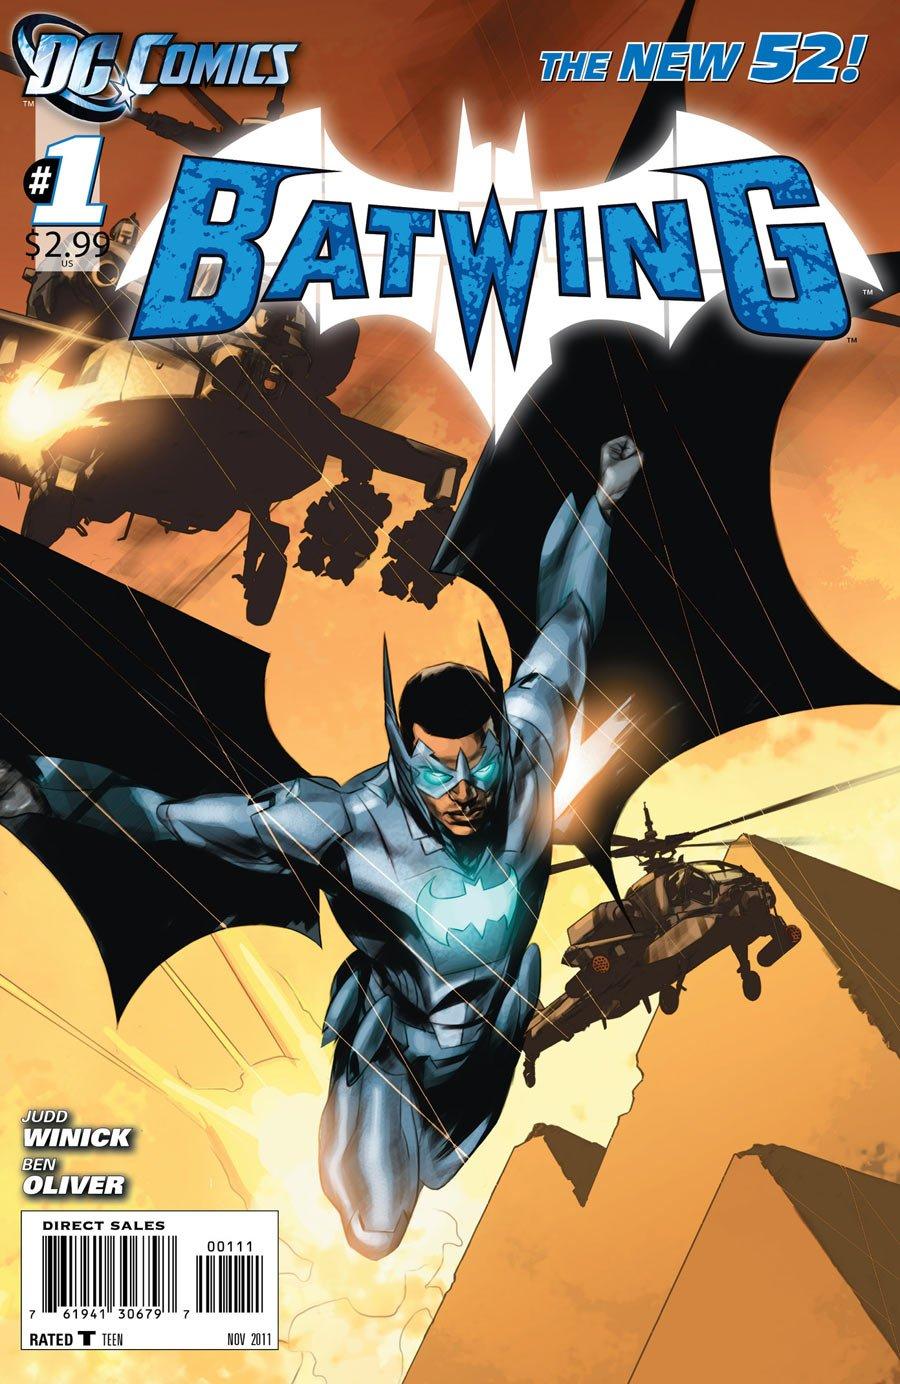 "Read Online Batwing #1 ""1st Print- Meet Batwing, the Batman of Africa"" ebook"